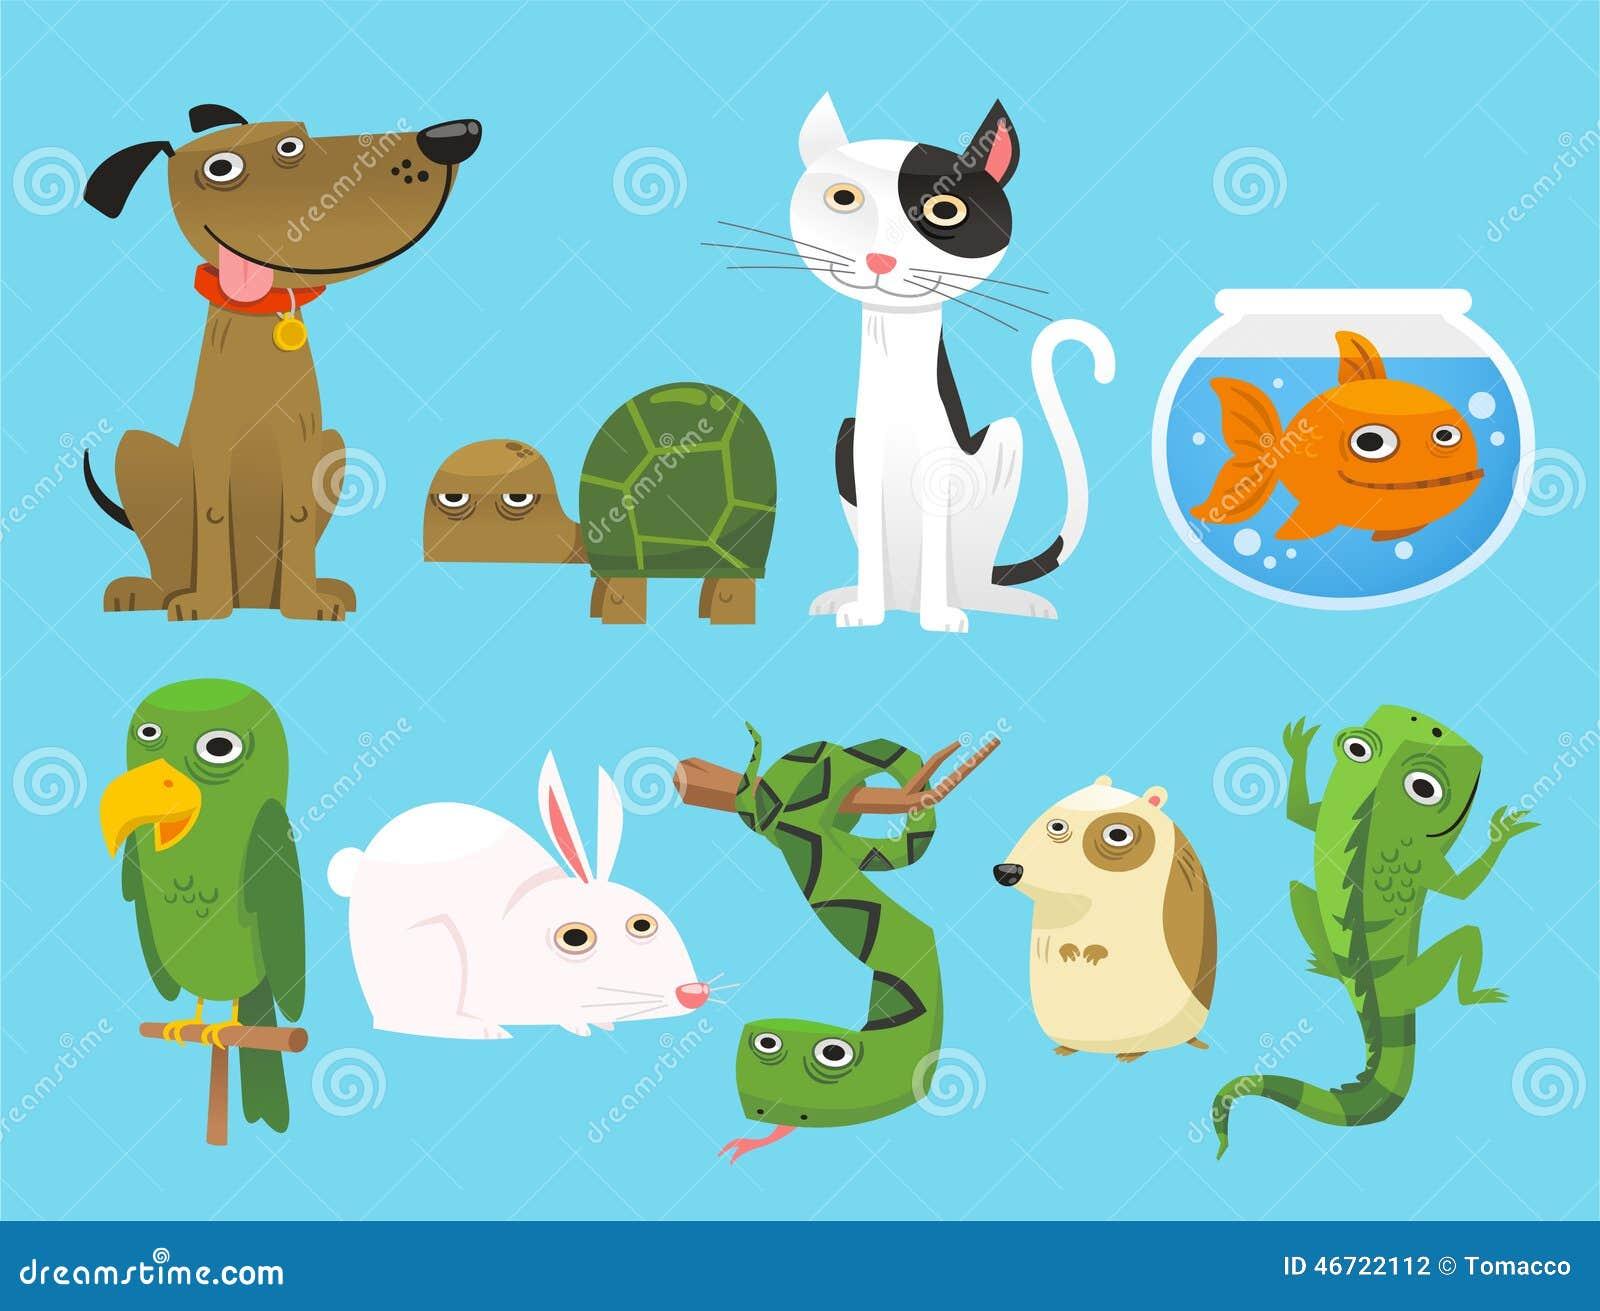 house pet set stock illustration image 46722112 fish tank images clip art fish aquarium clipart